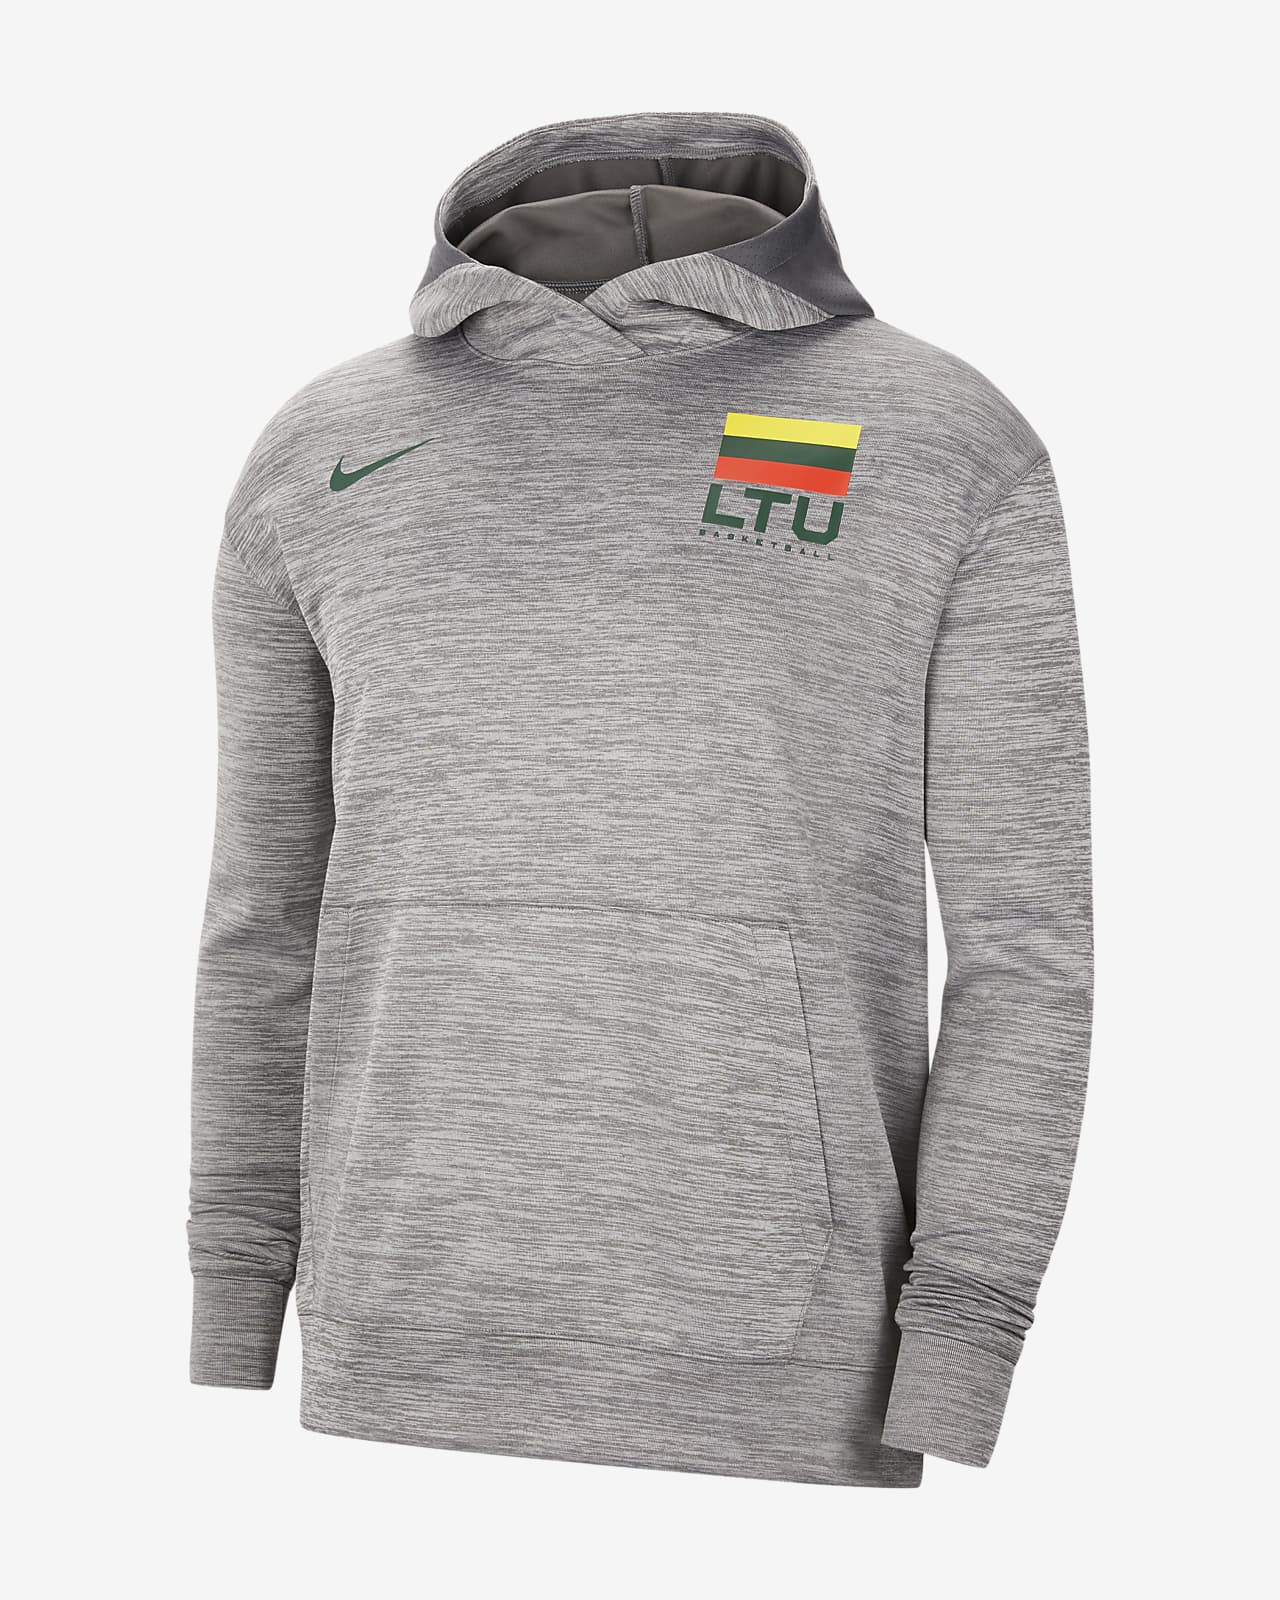 Lithuania Nike Spotlight Men's Basketball Hoodie